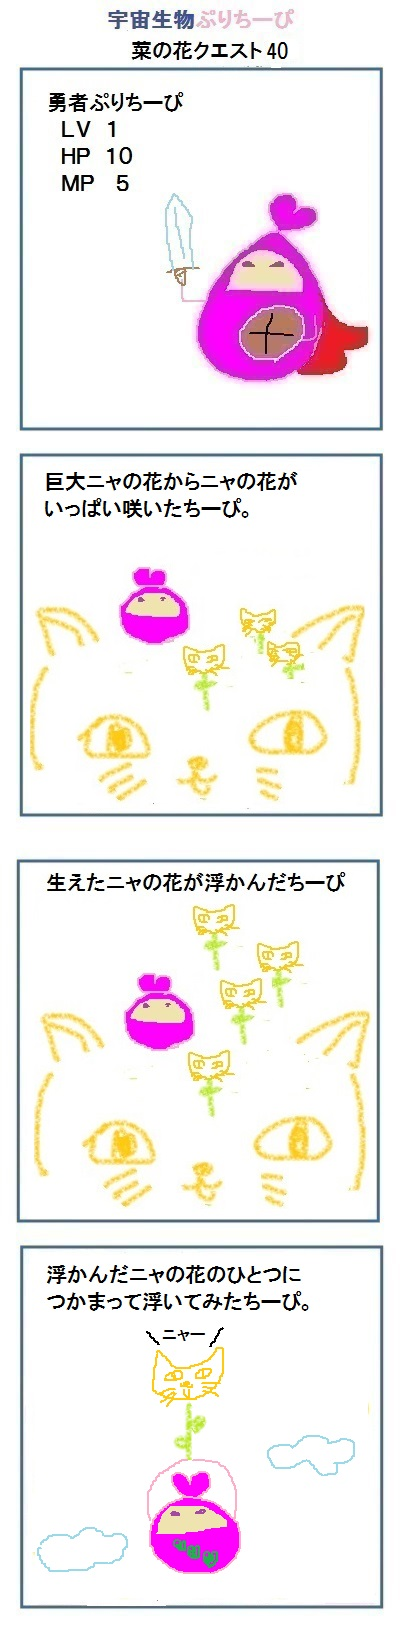 160423_nanohana_quest40.jpg